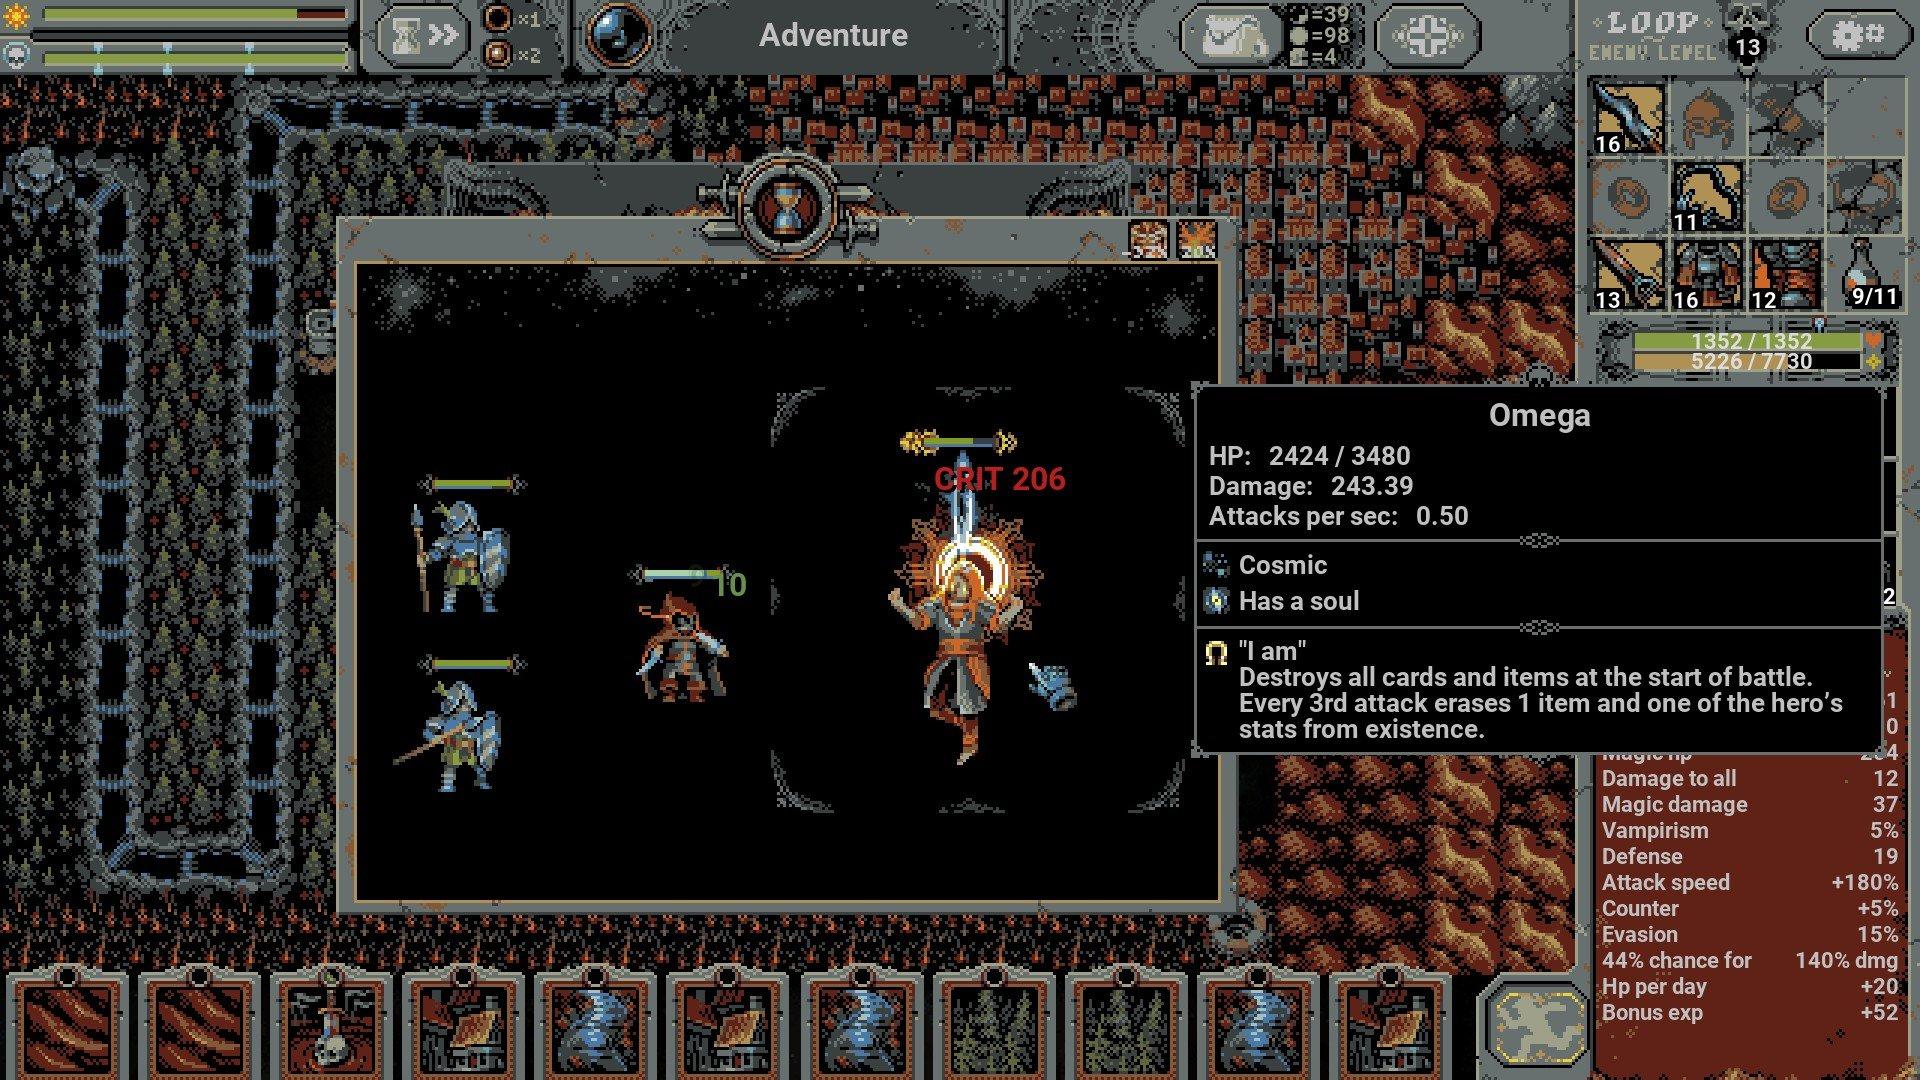 Loop Hero - Chapter 4 Boss Trait